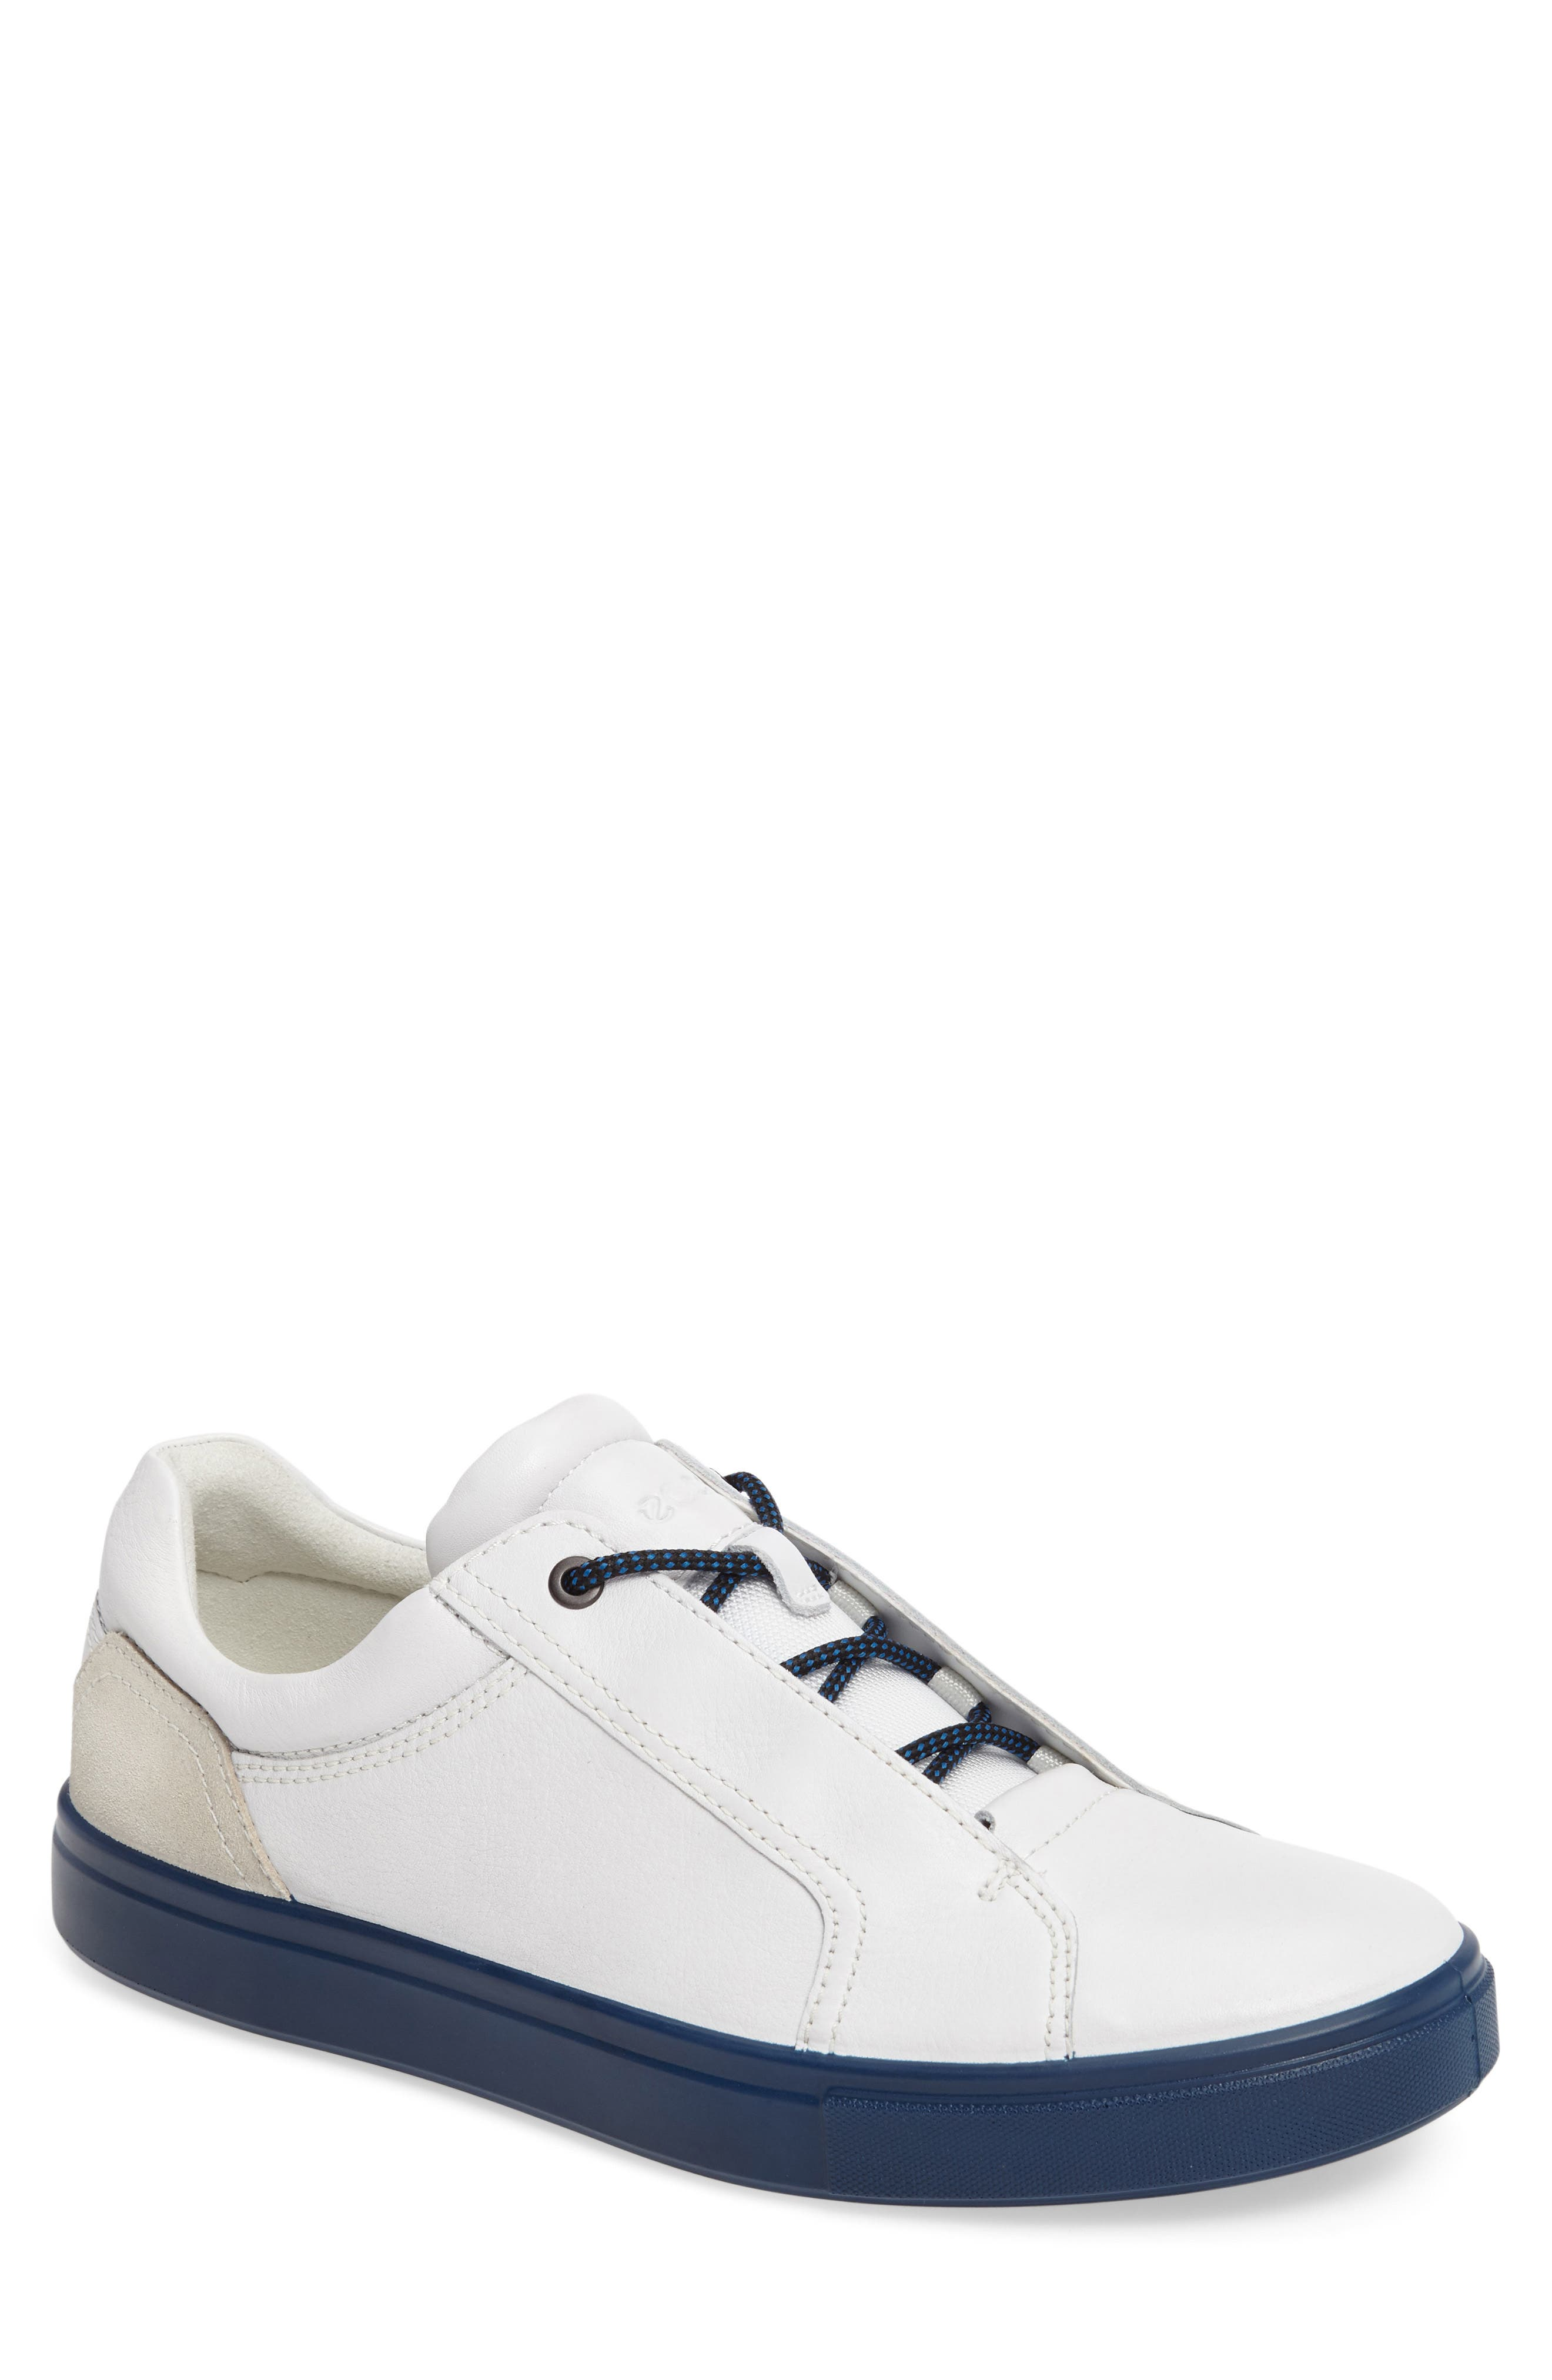 Kyle Sneaker,                         Main,                         color, White